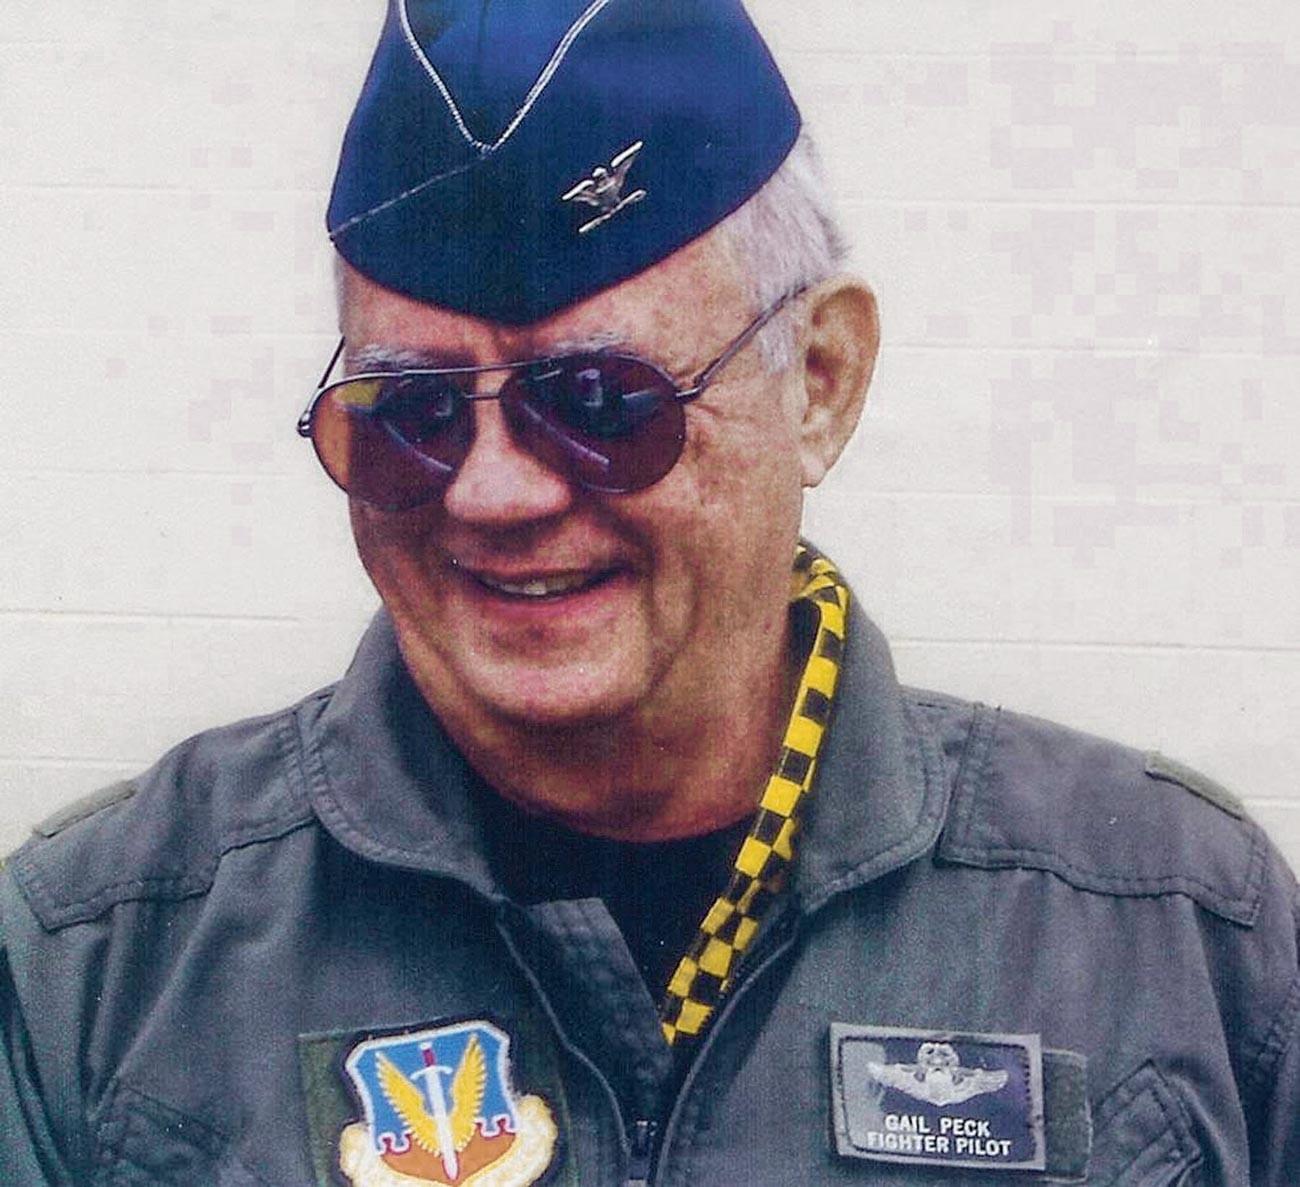 Oberst Gail Peck